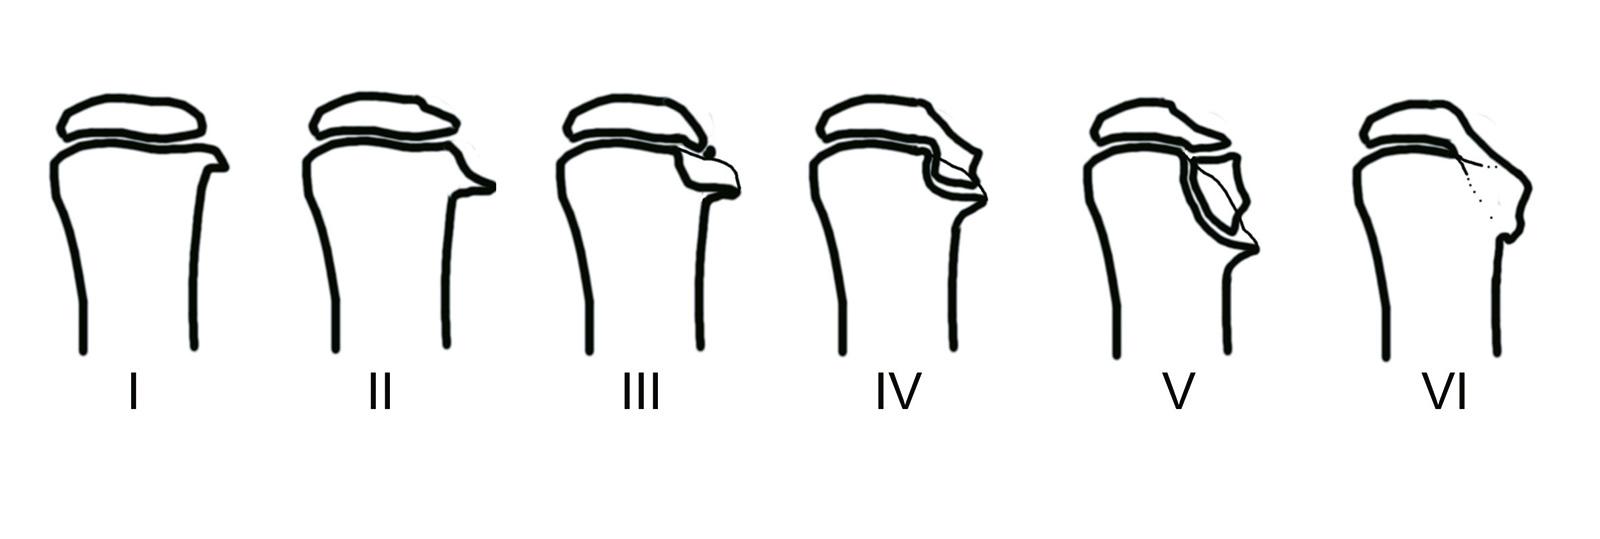 Abb. 4-33: Langenskiöld Klassifikation (in Anlehnung: Langenskiöld A. J Bone Joint Surg 1964; 46-A: 1405)